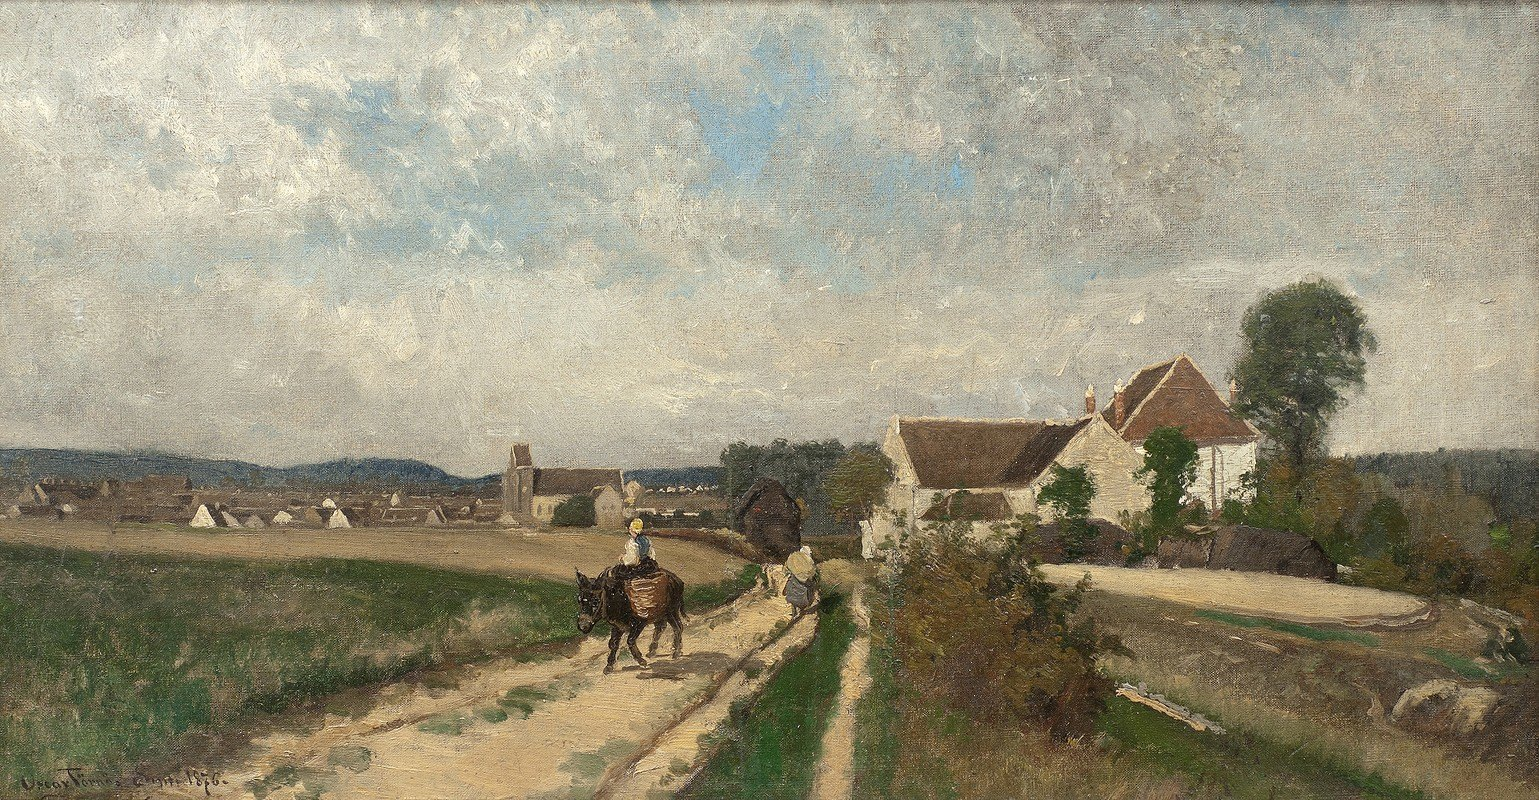 Oscar Törnå - Landscape near Grez-sur-Loing